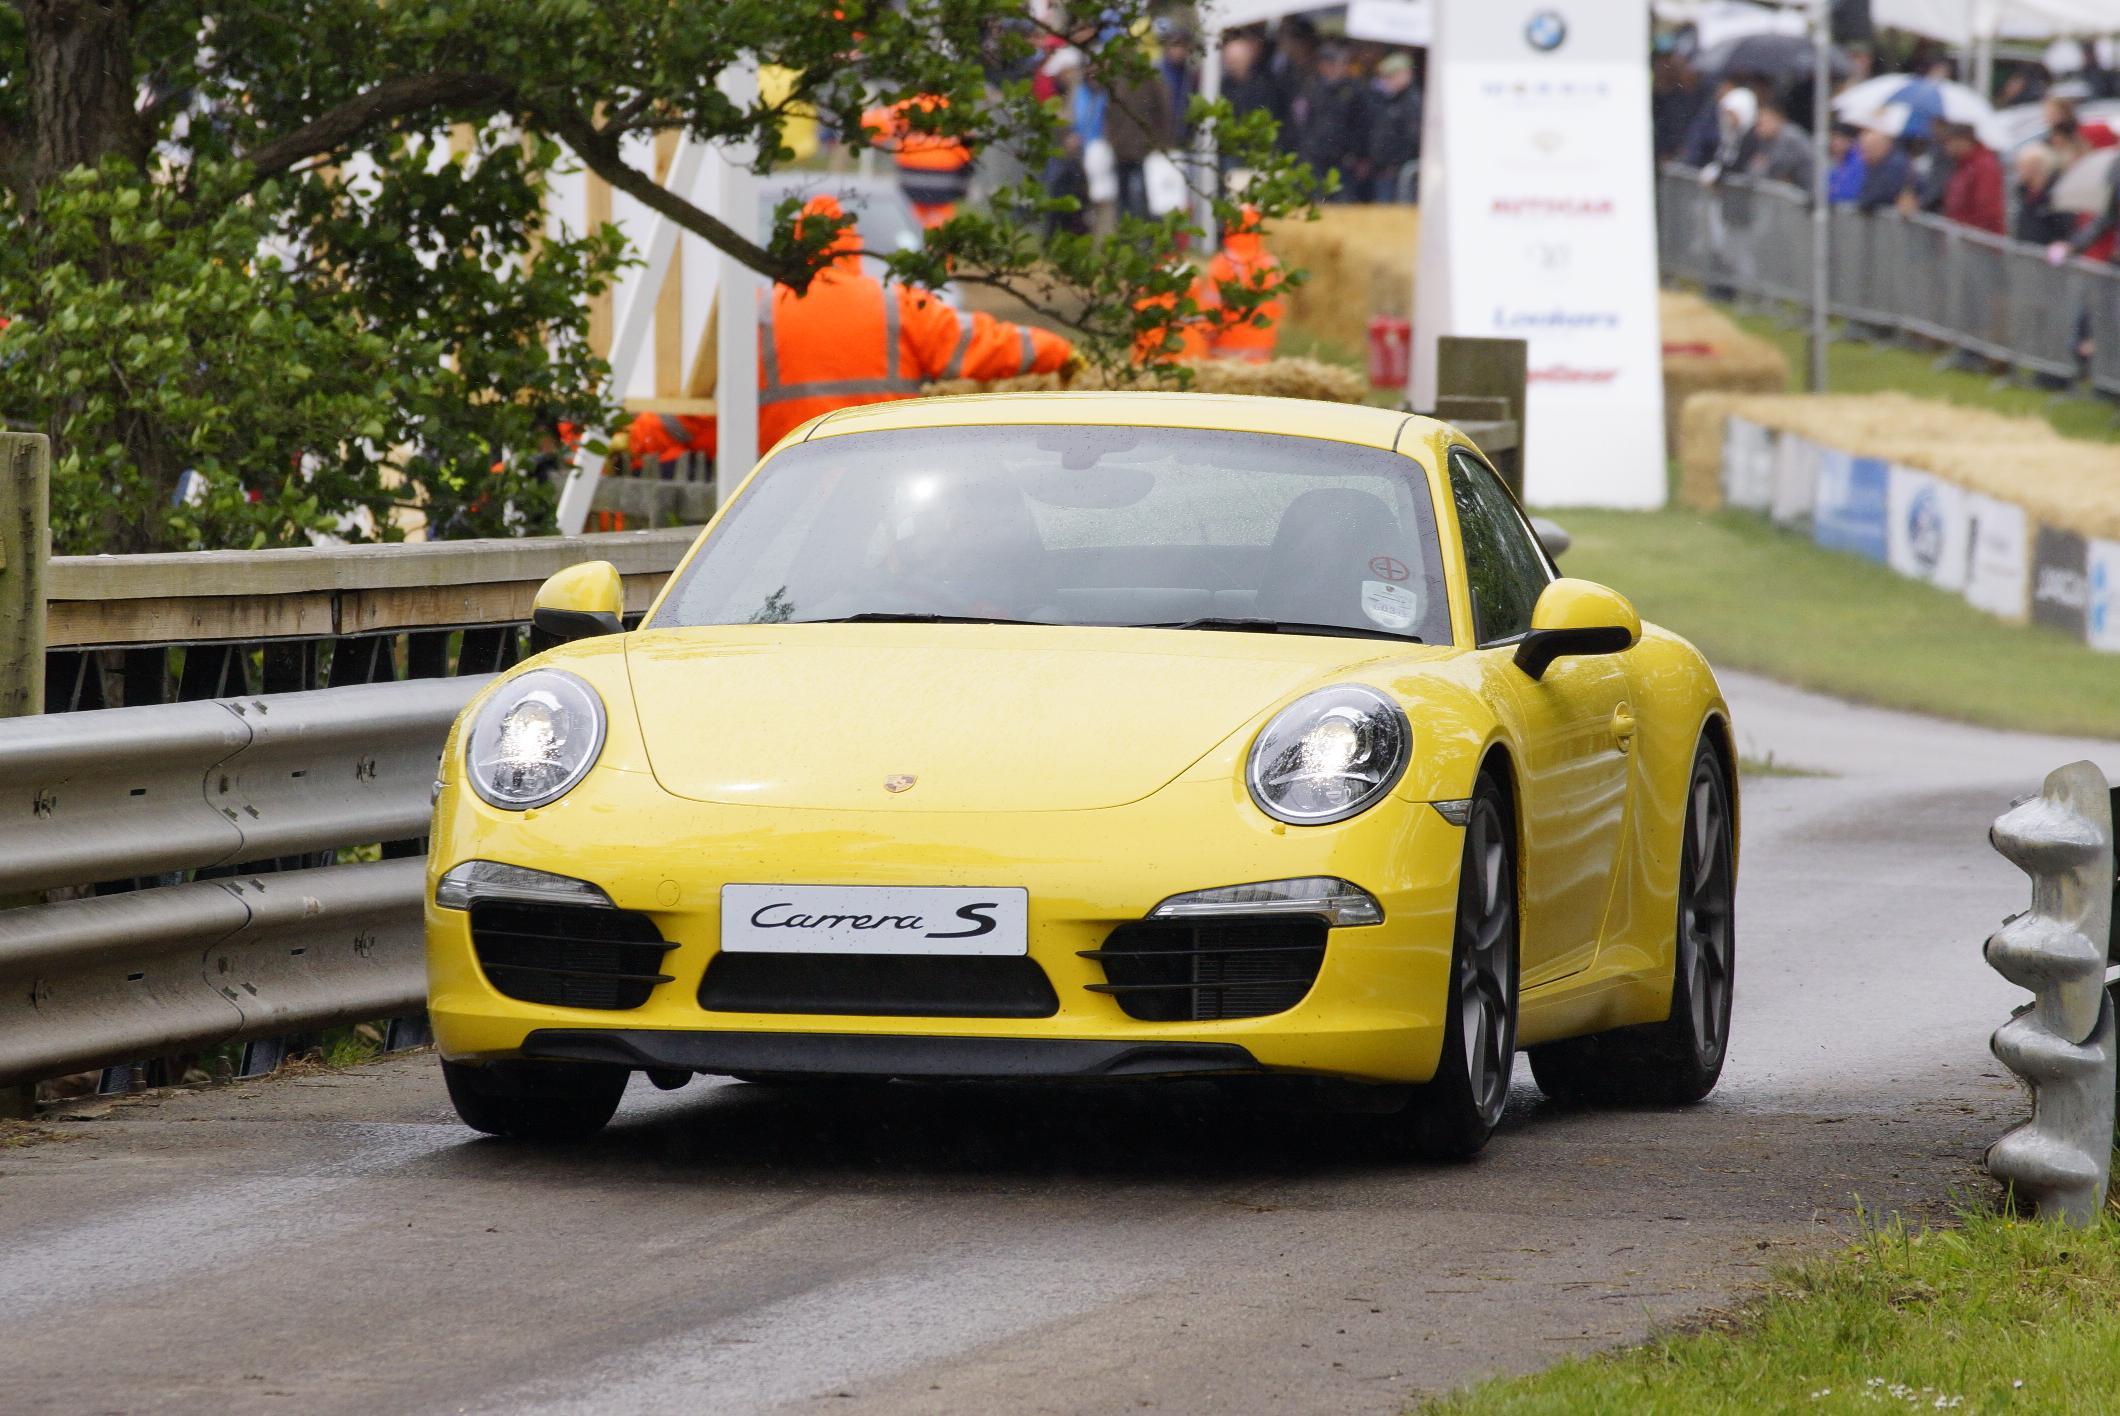 Porsche 911 Carrera S Cholmondeley 2012